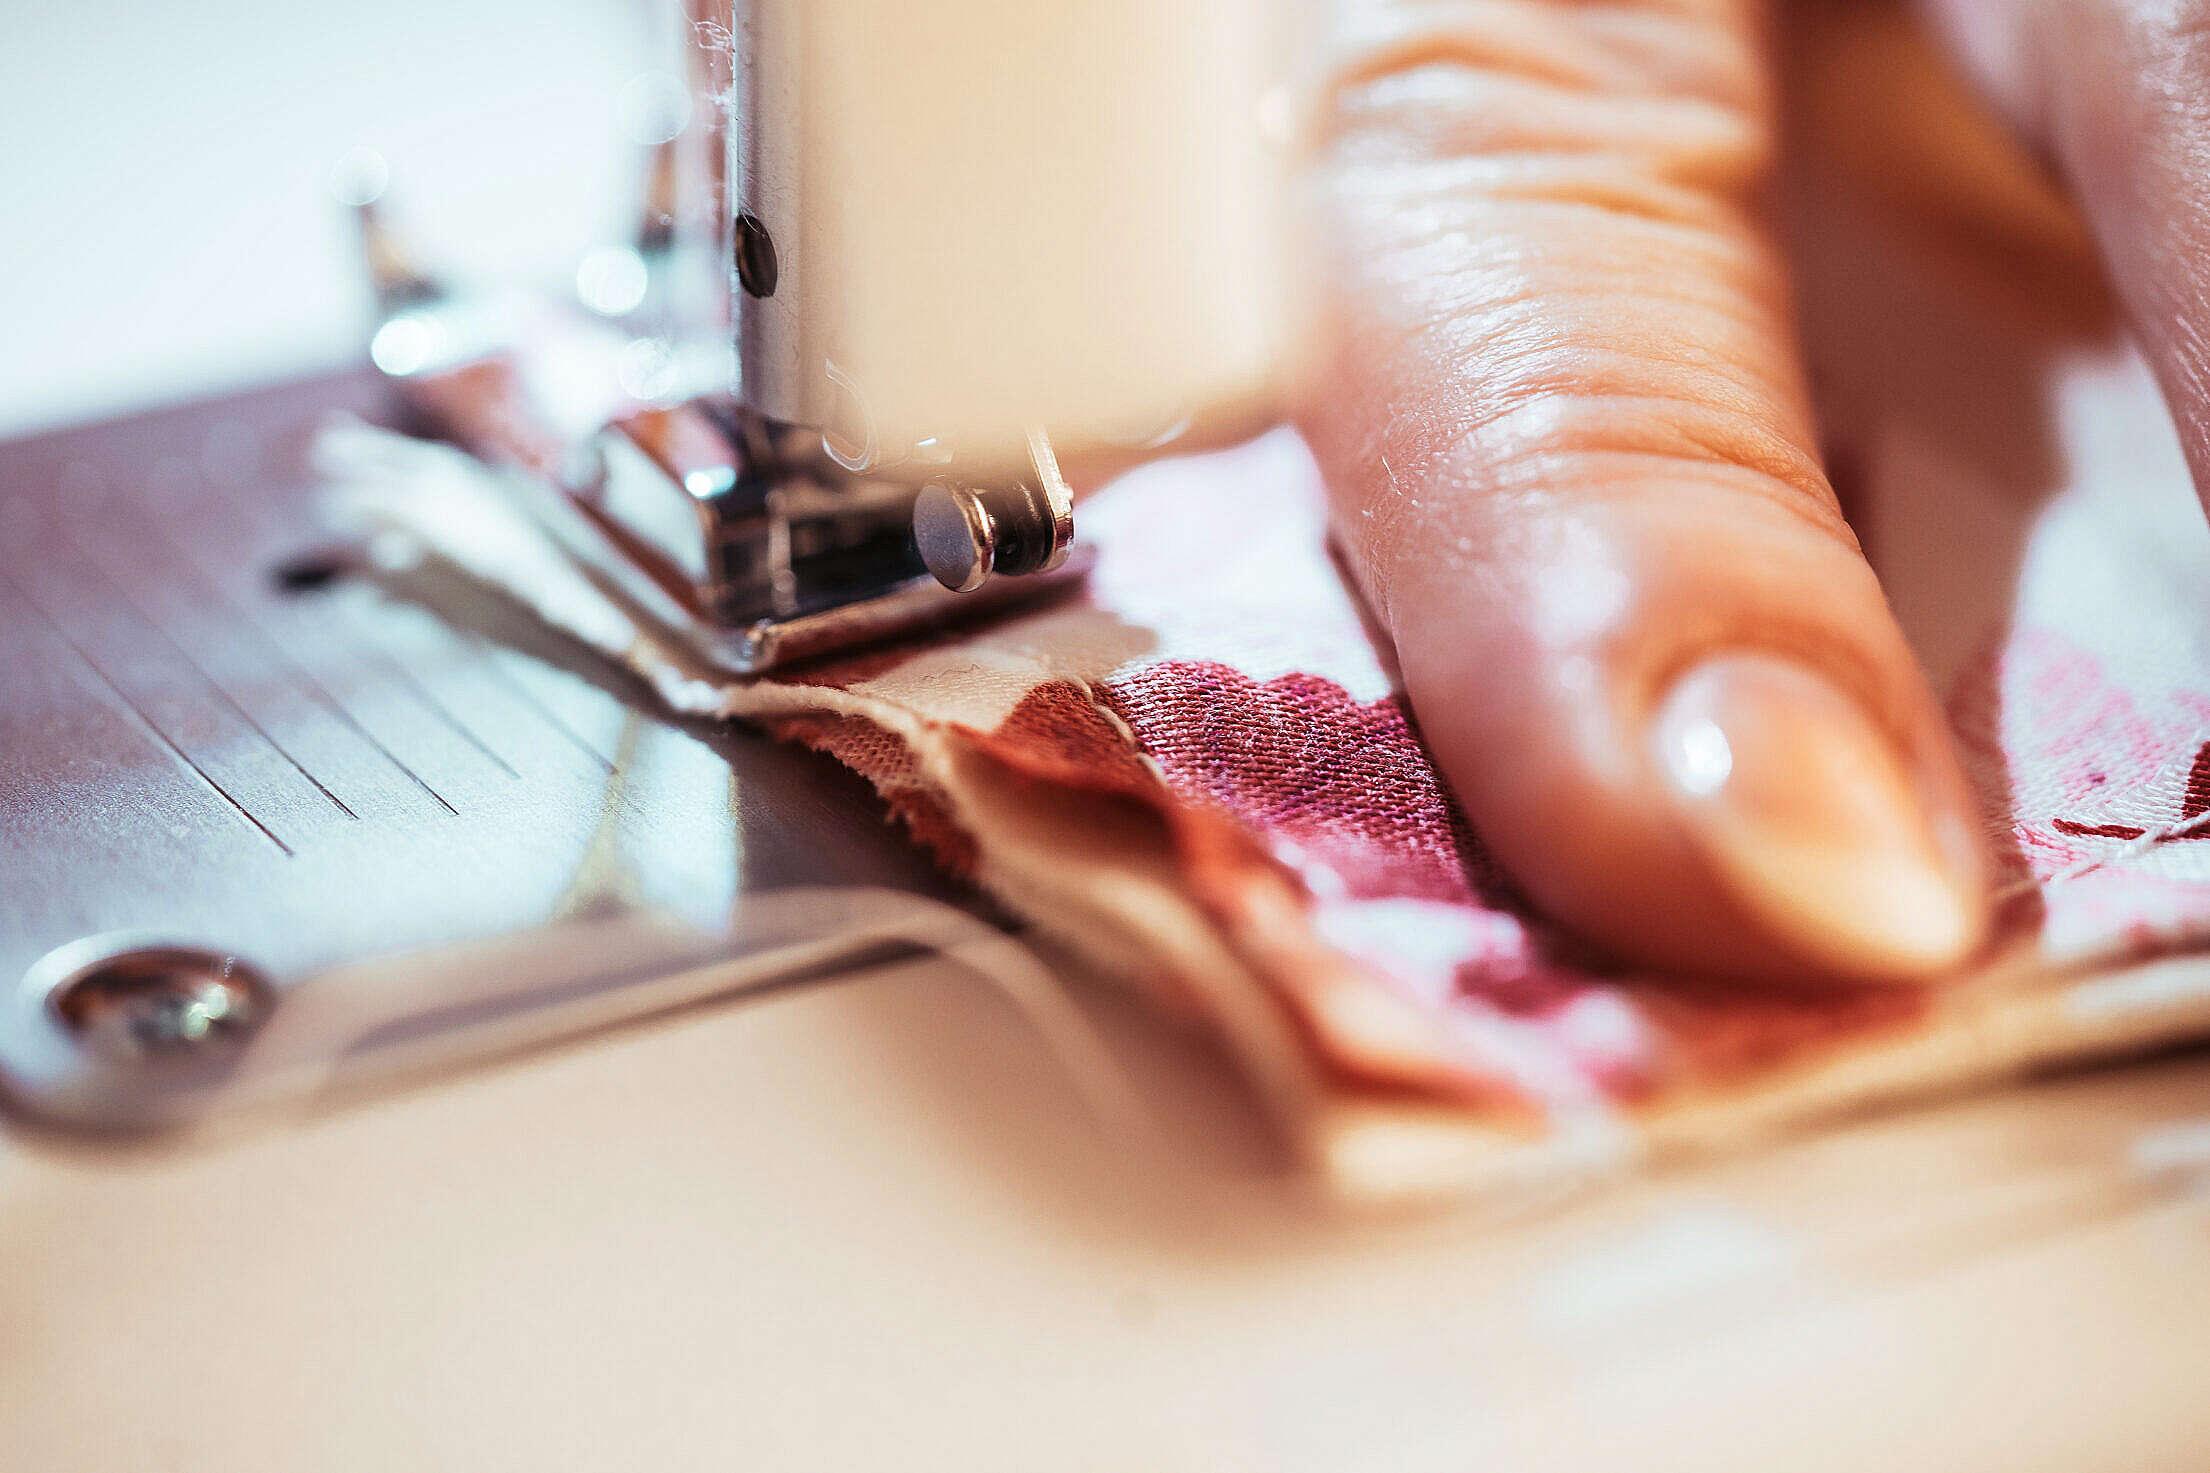 Seamstress Sewing Face Mask Free Stock Photo